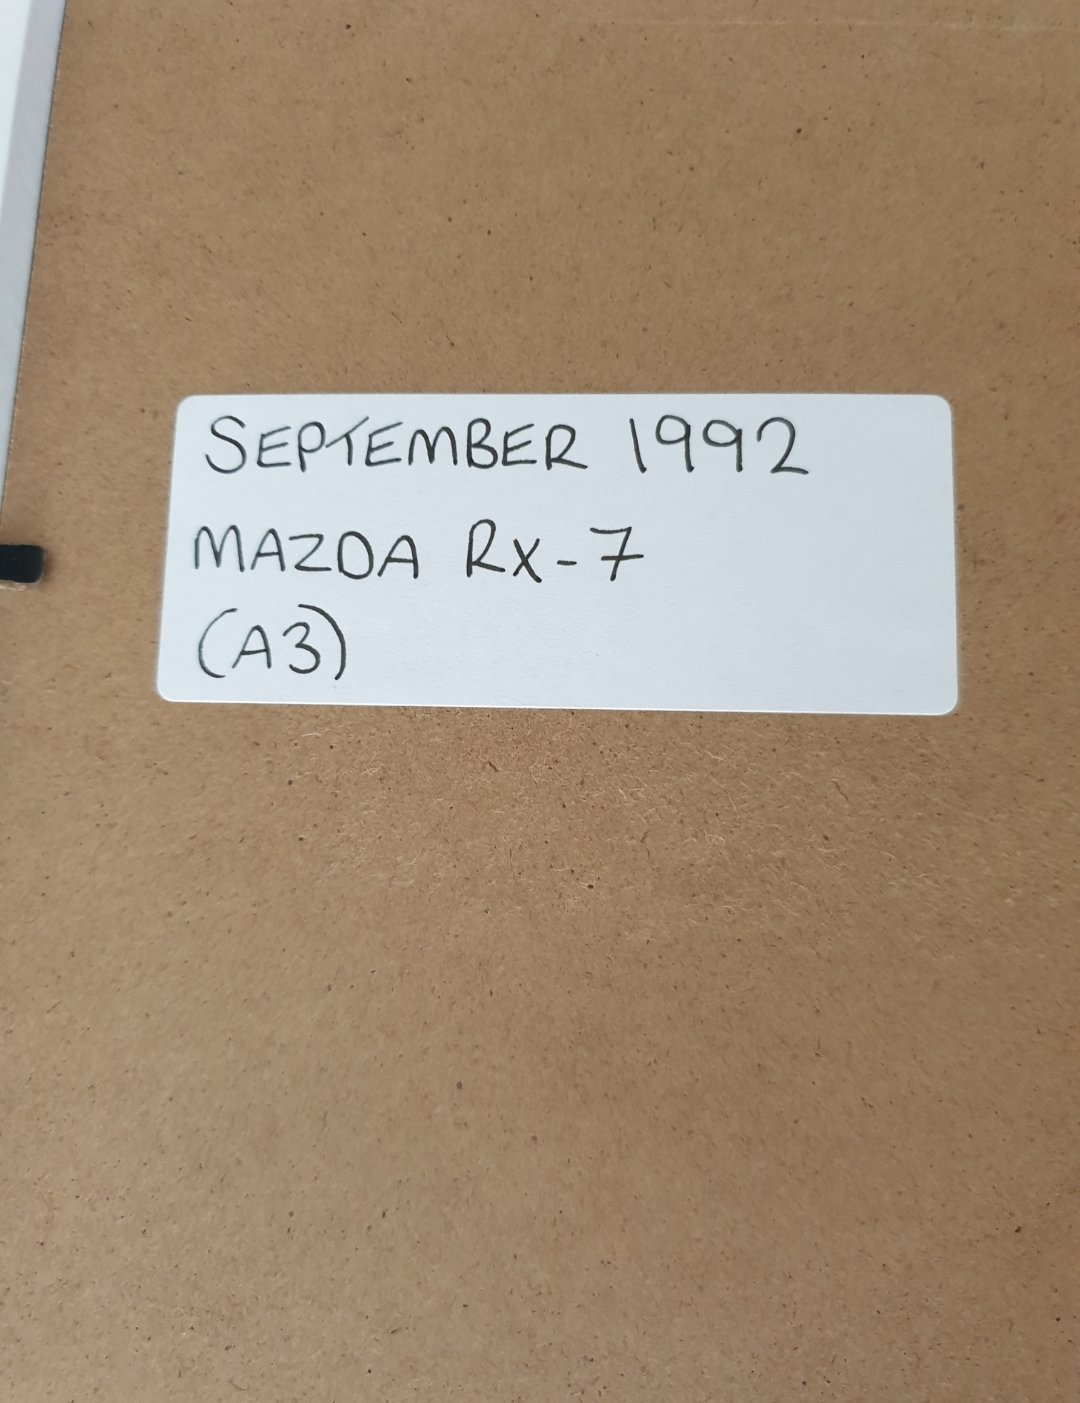 1992 Original Mazda RX-7 Framed Advert For Sale (picture 2 of 2)